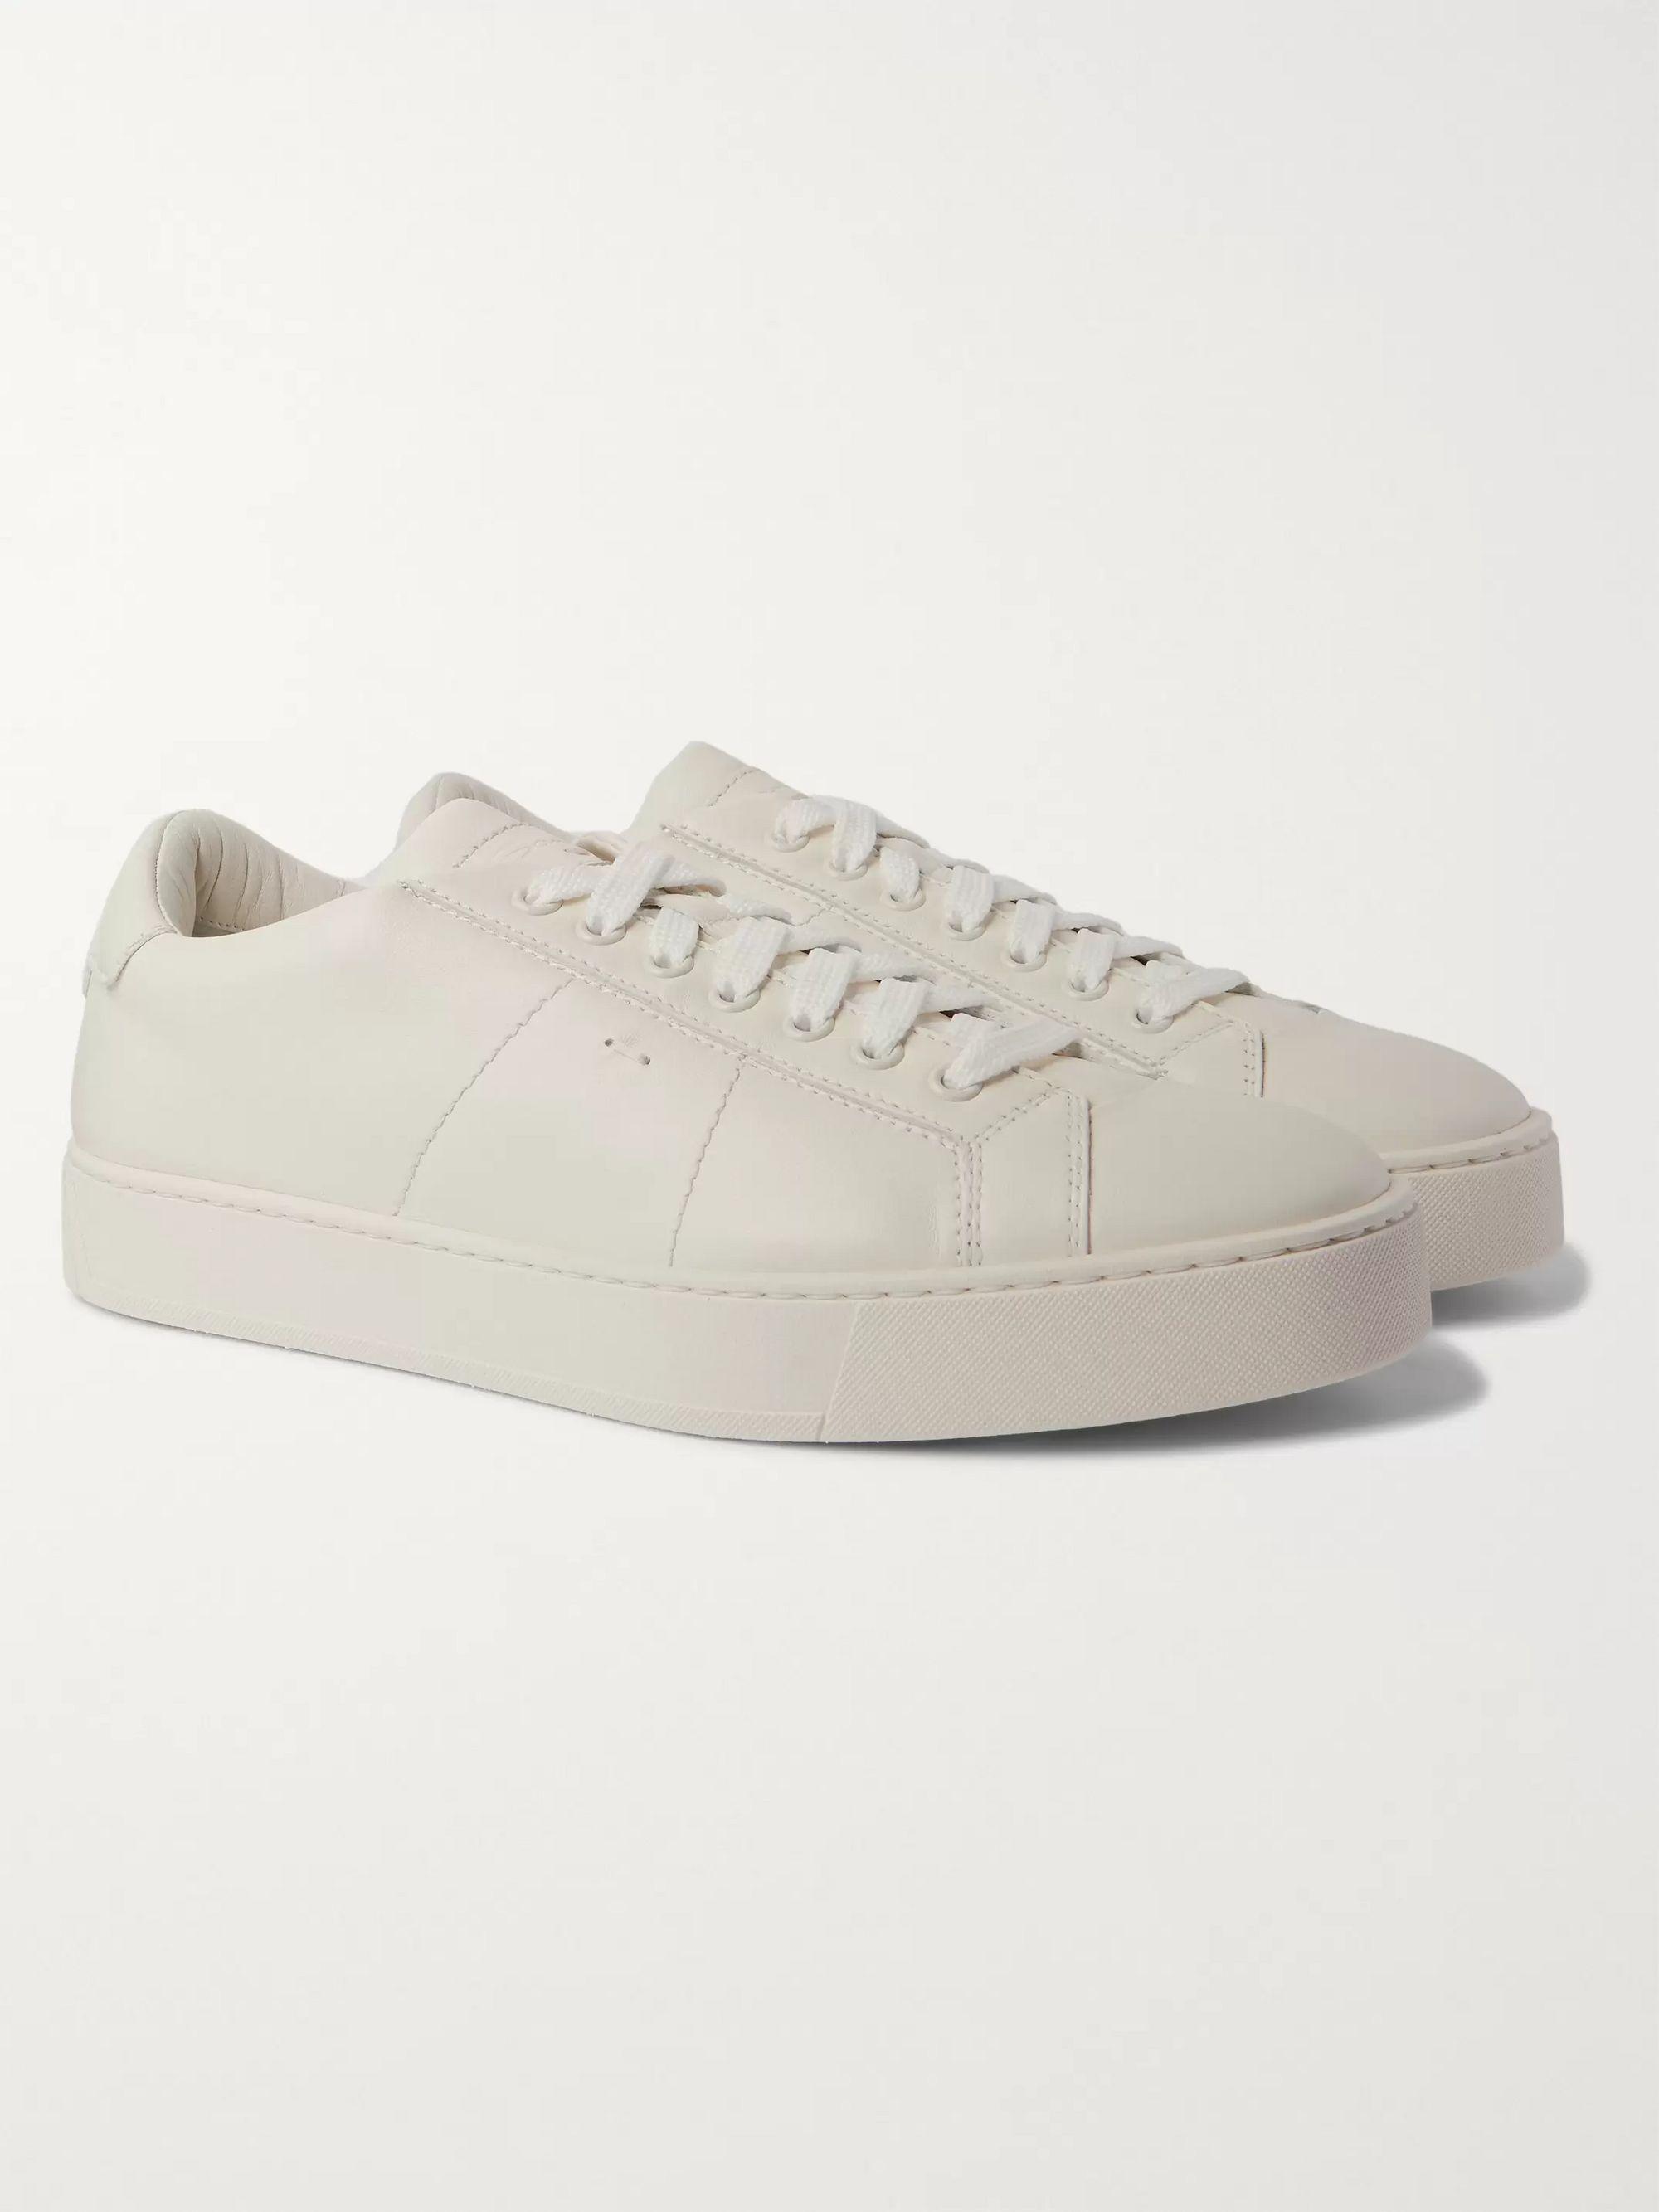 Leather Sneakers   Santoni   MR PORTER